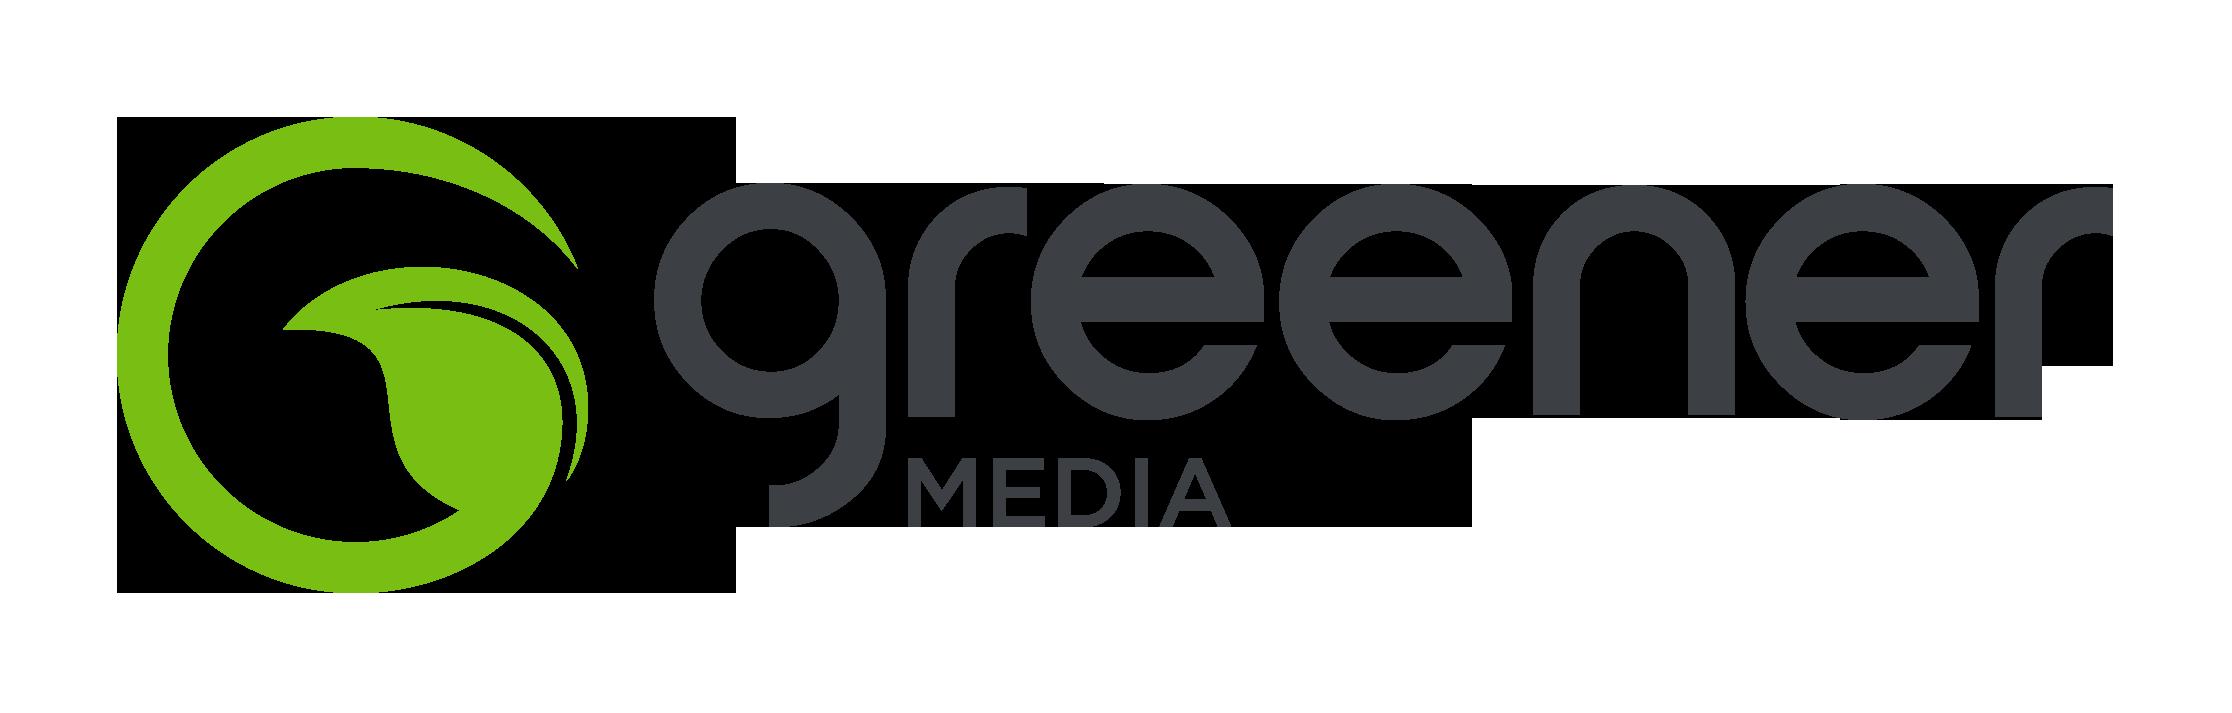 Greener Media logo